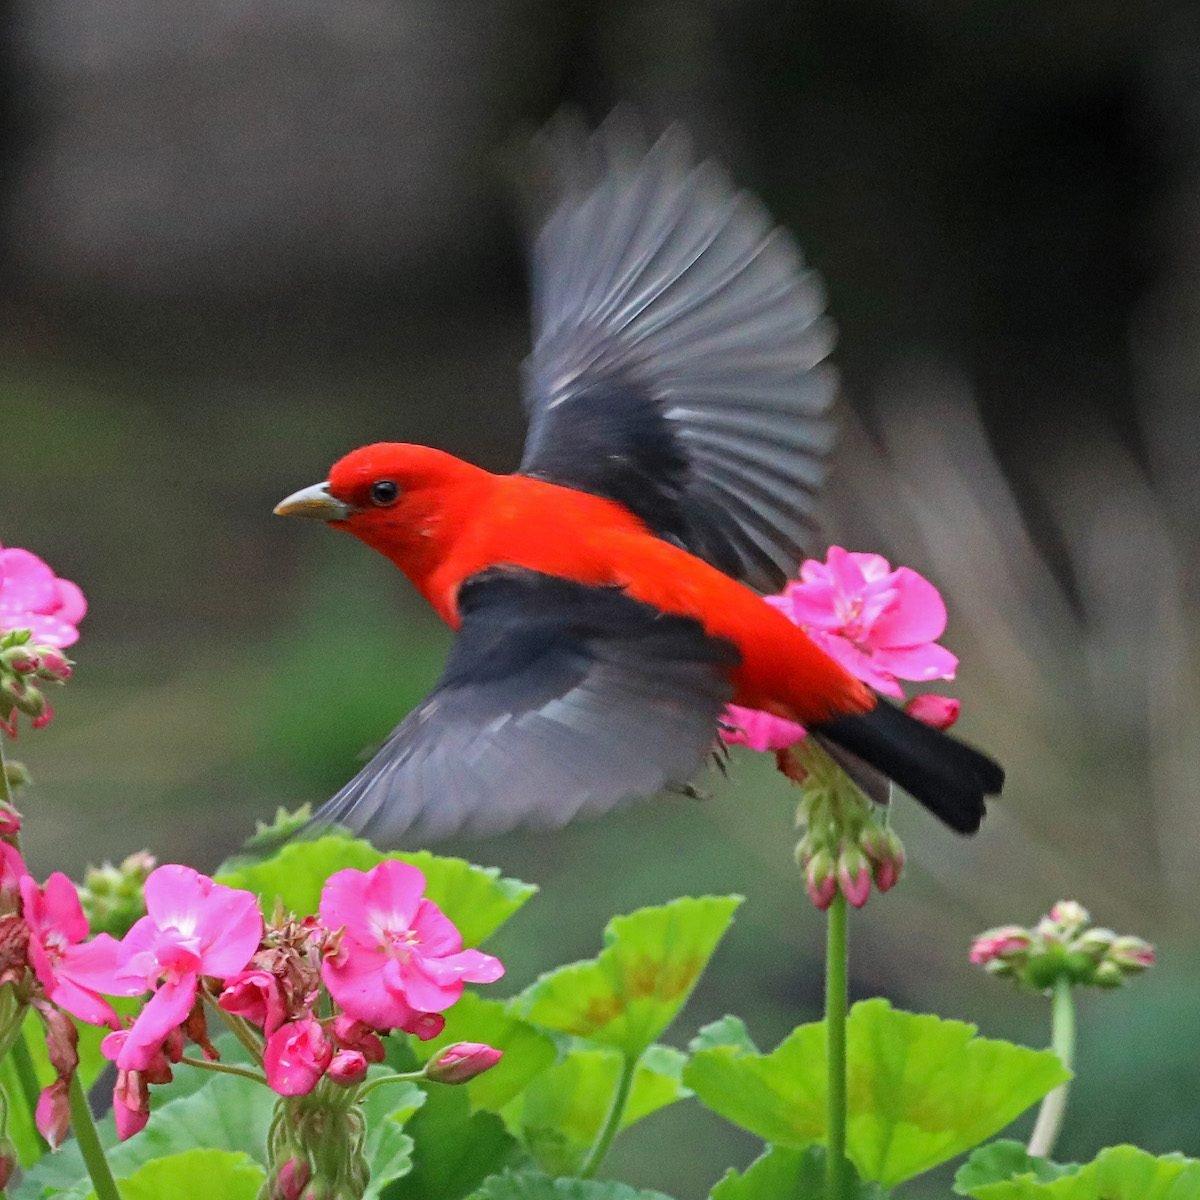 scarlet tanager spring birds Rodger Boehm Bnb Bypc 2020